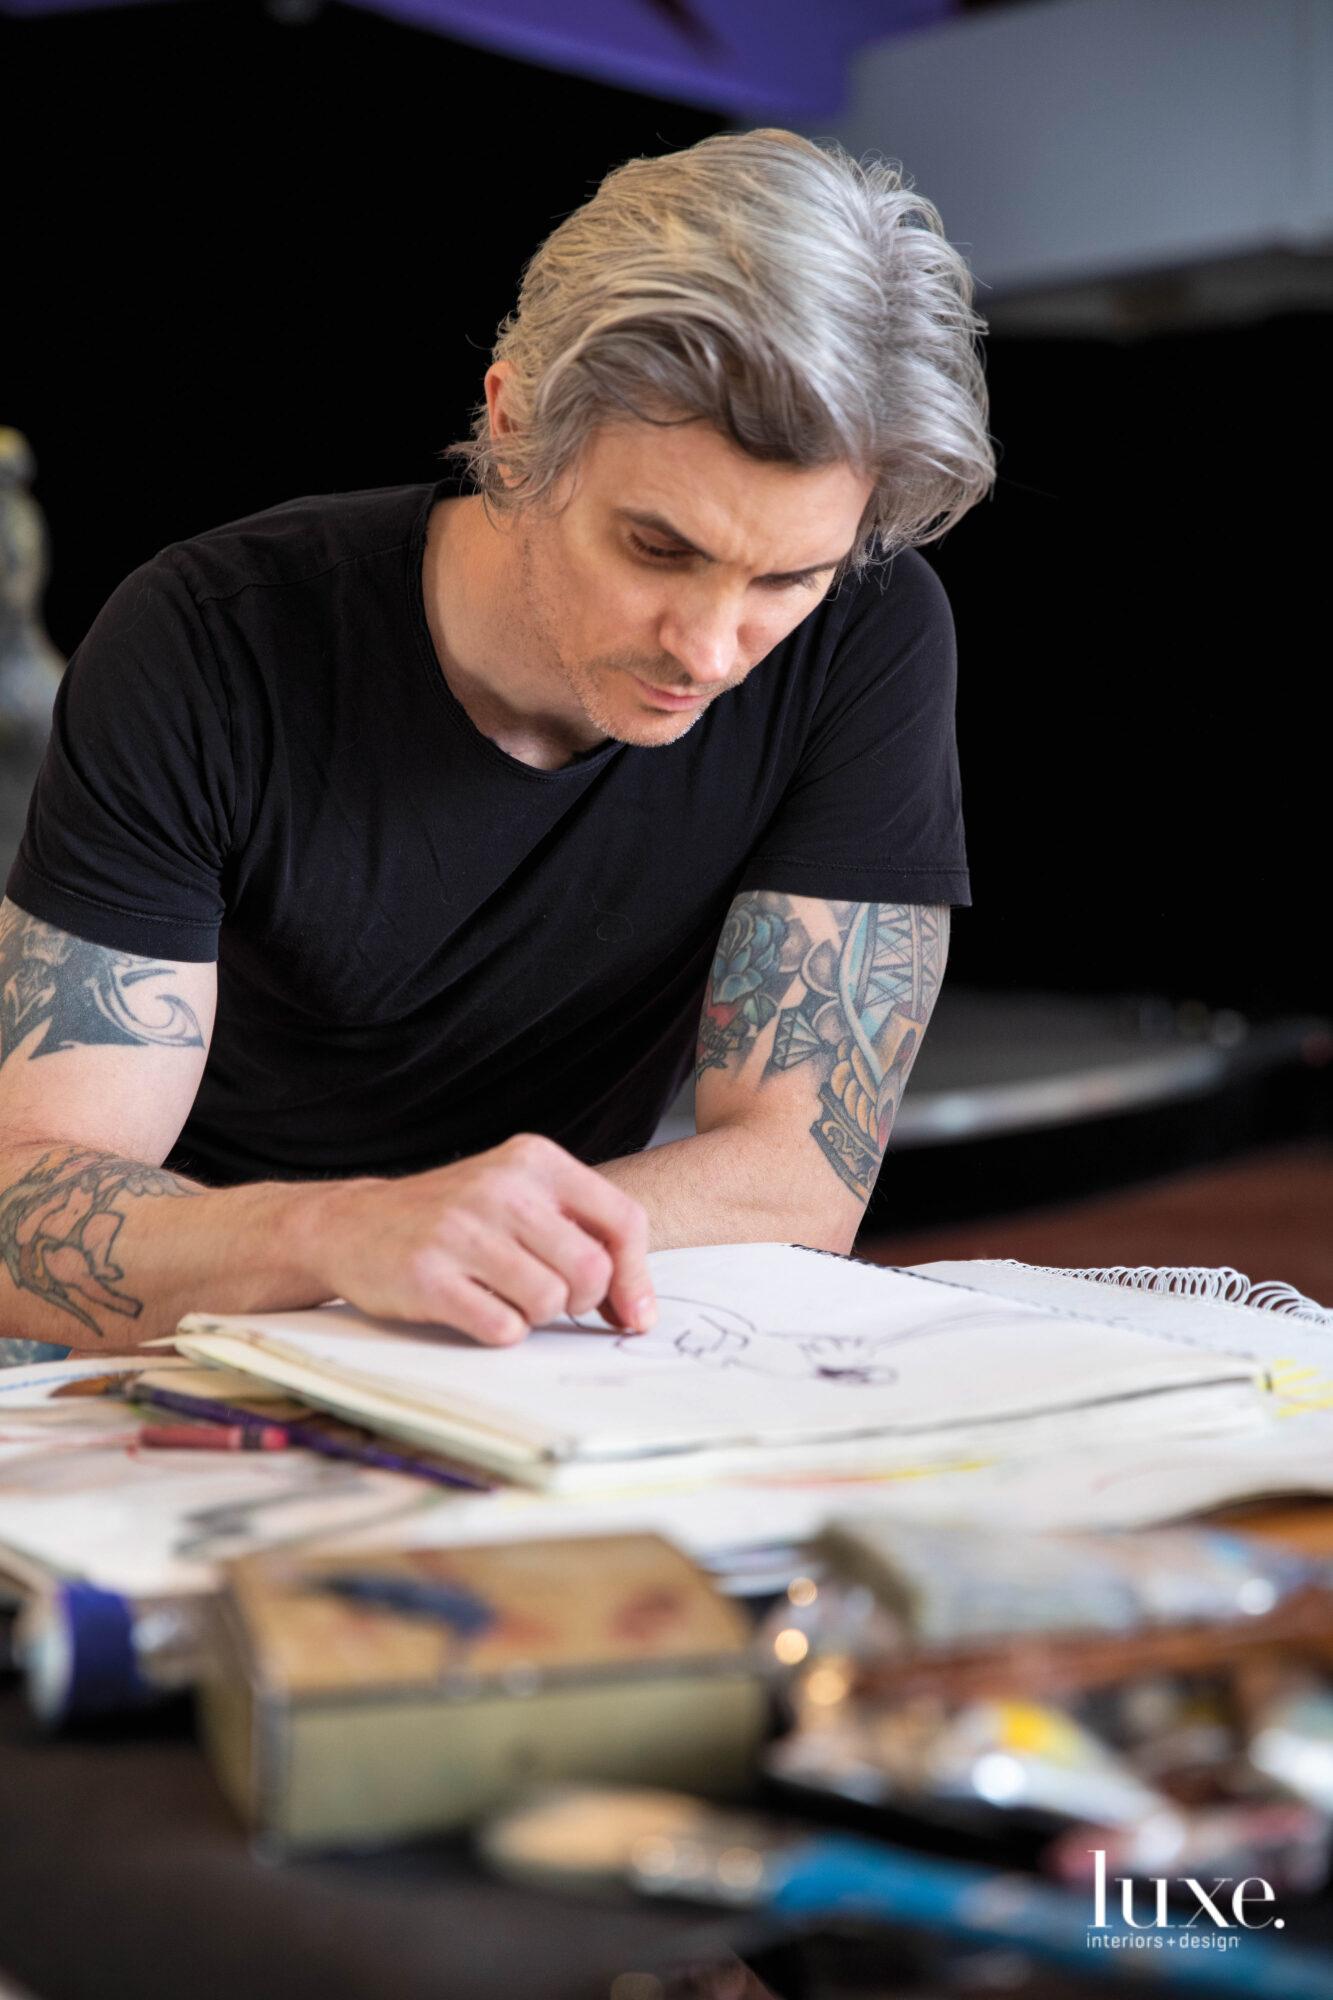 Damian Gomez at work in his studio